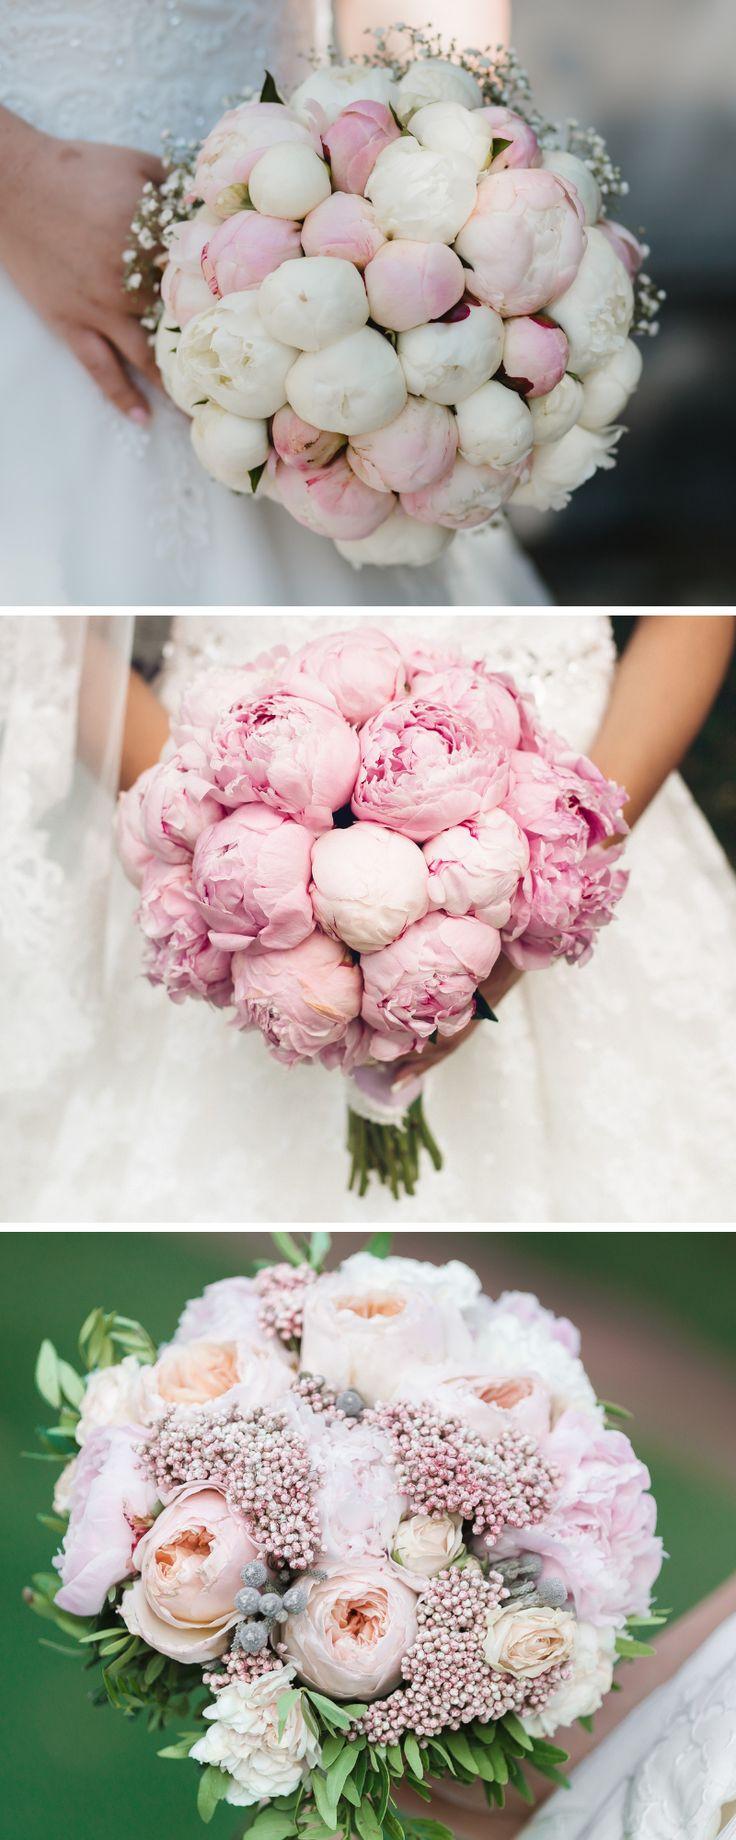 50 beautiful pink wedding decoration ideas – Творчество своими руками